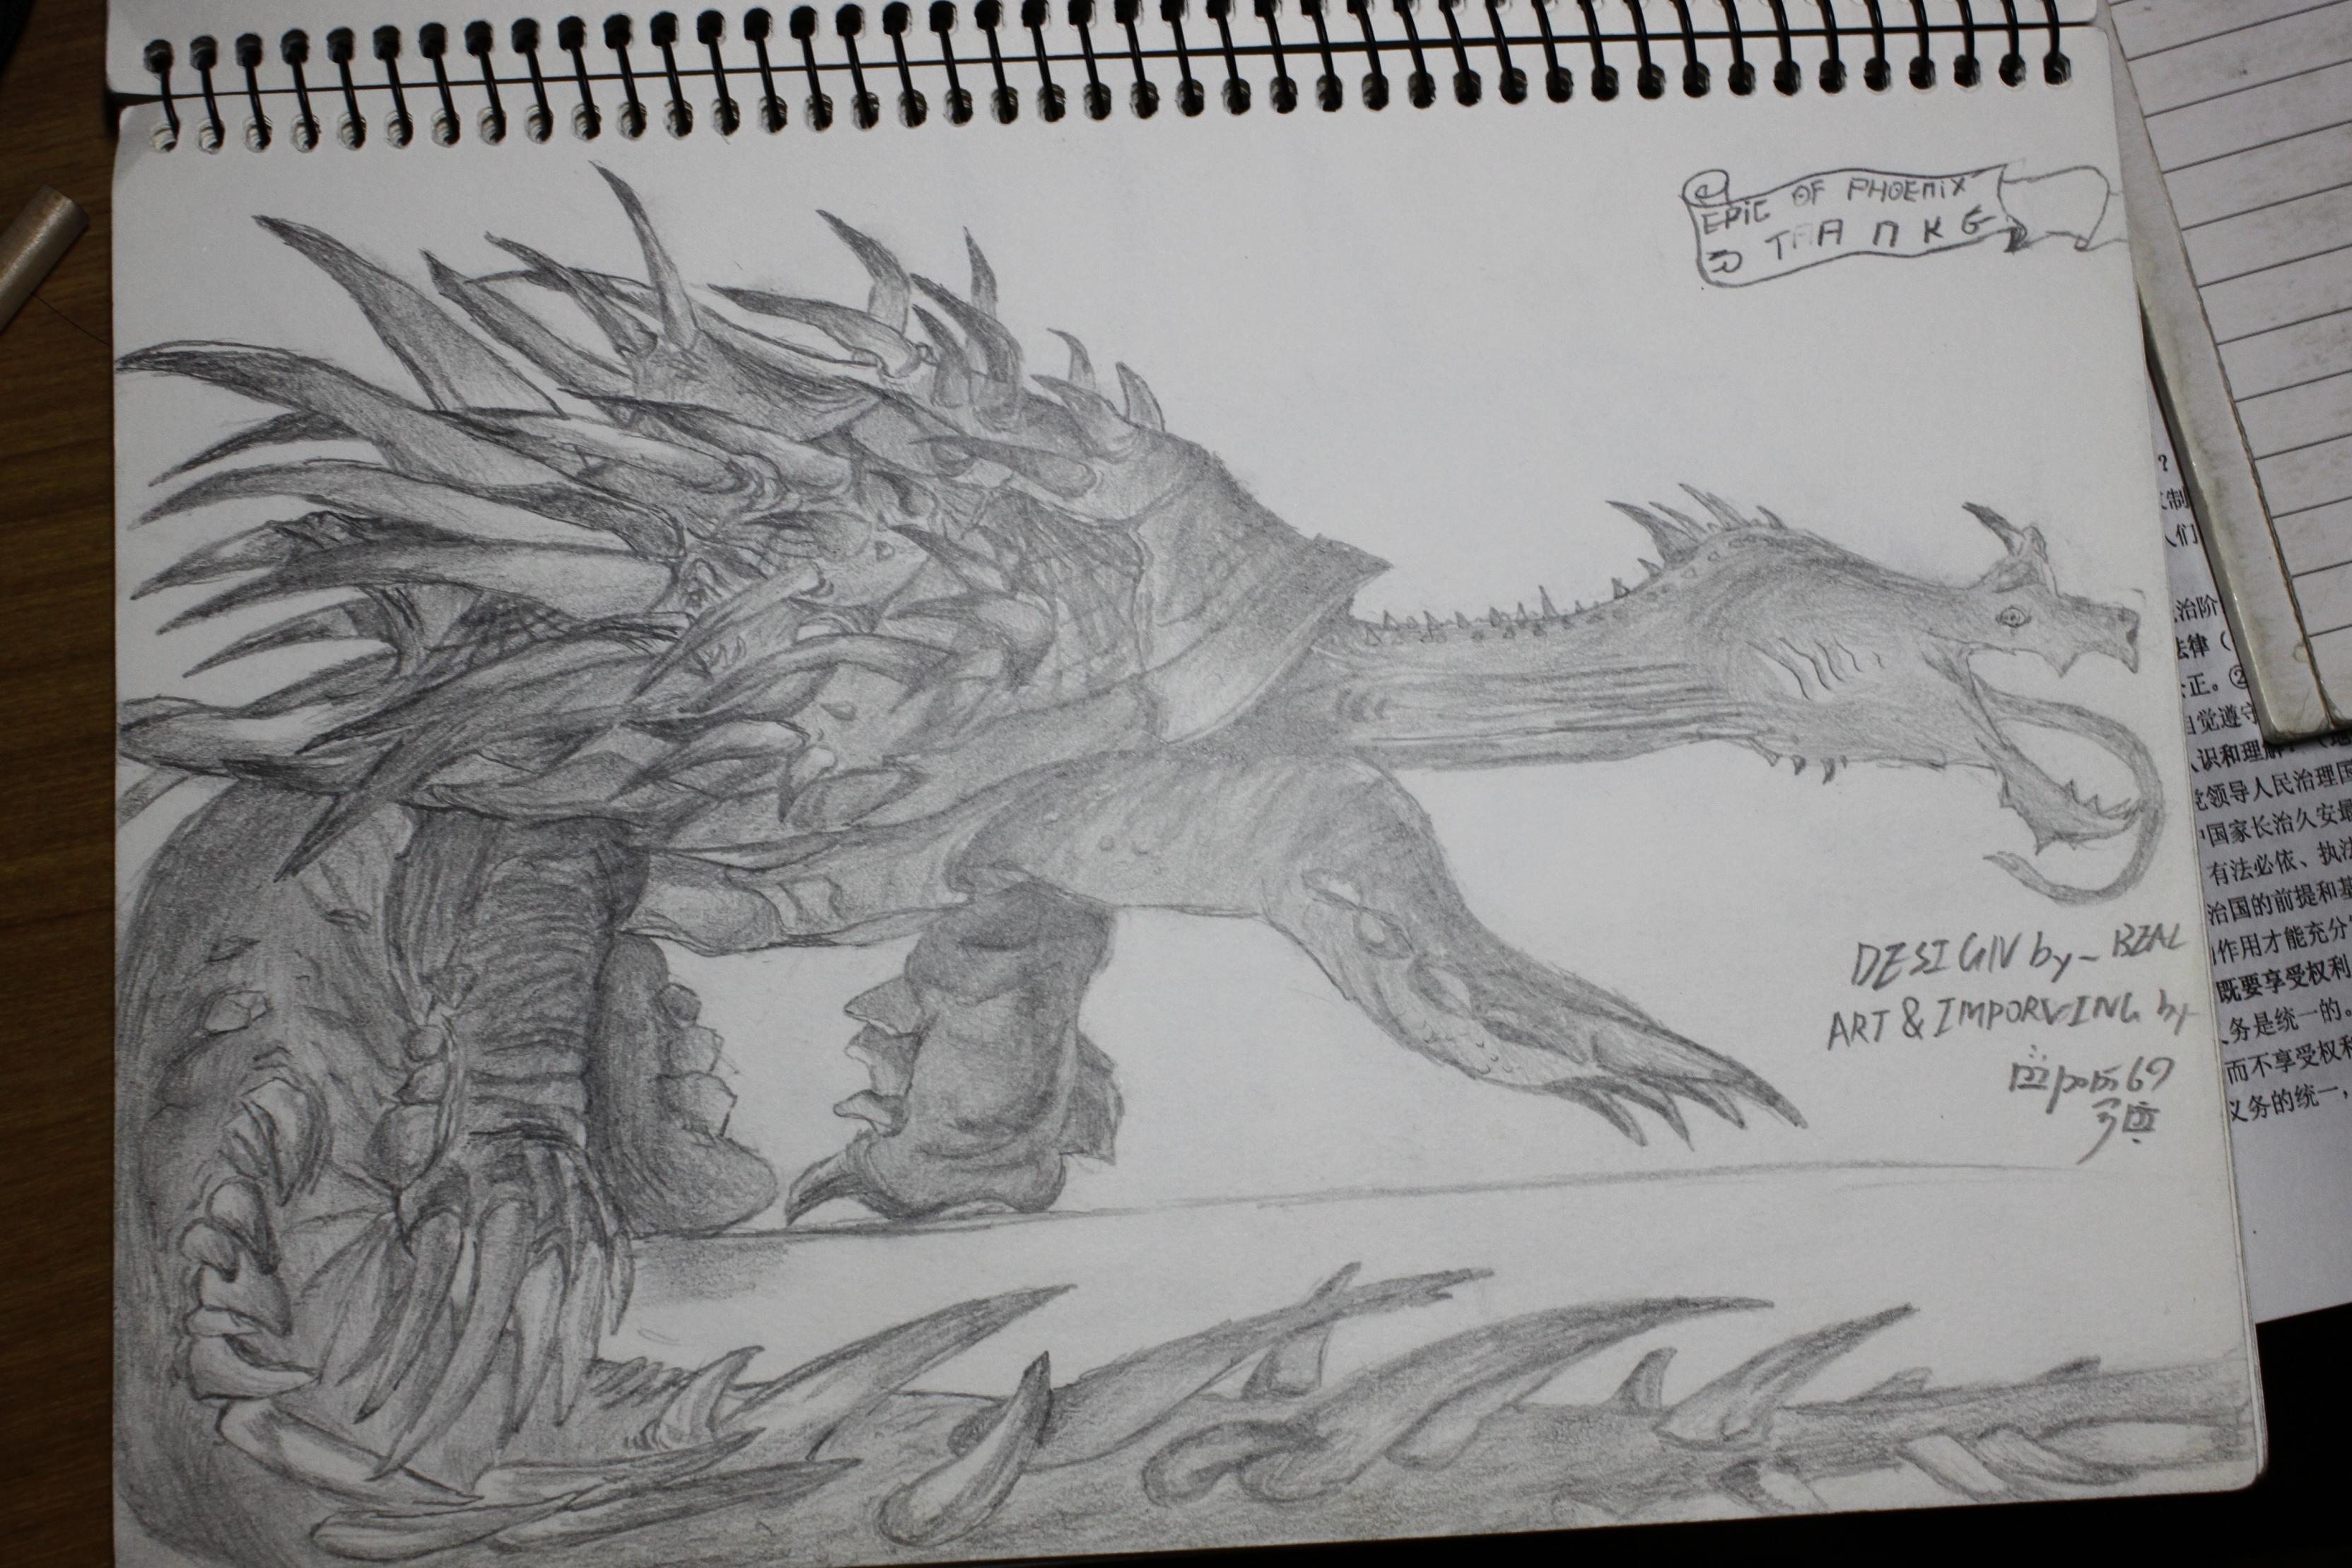 A behemoth